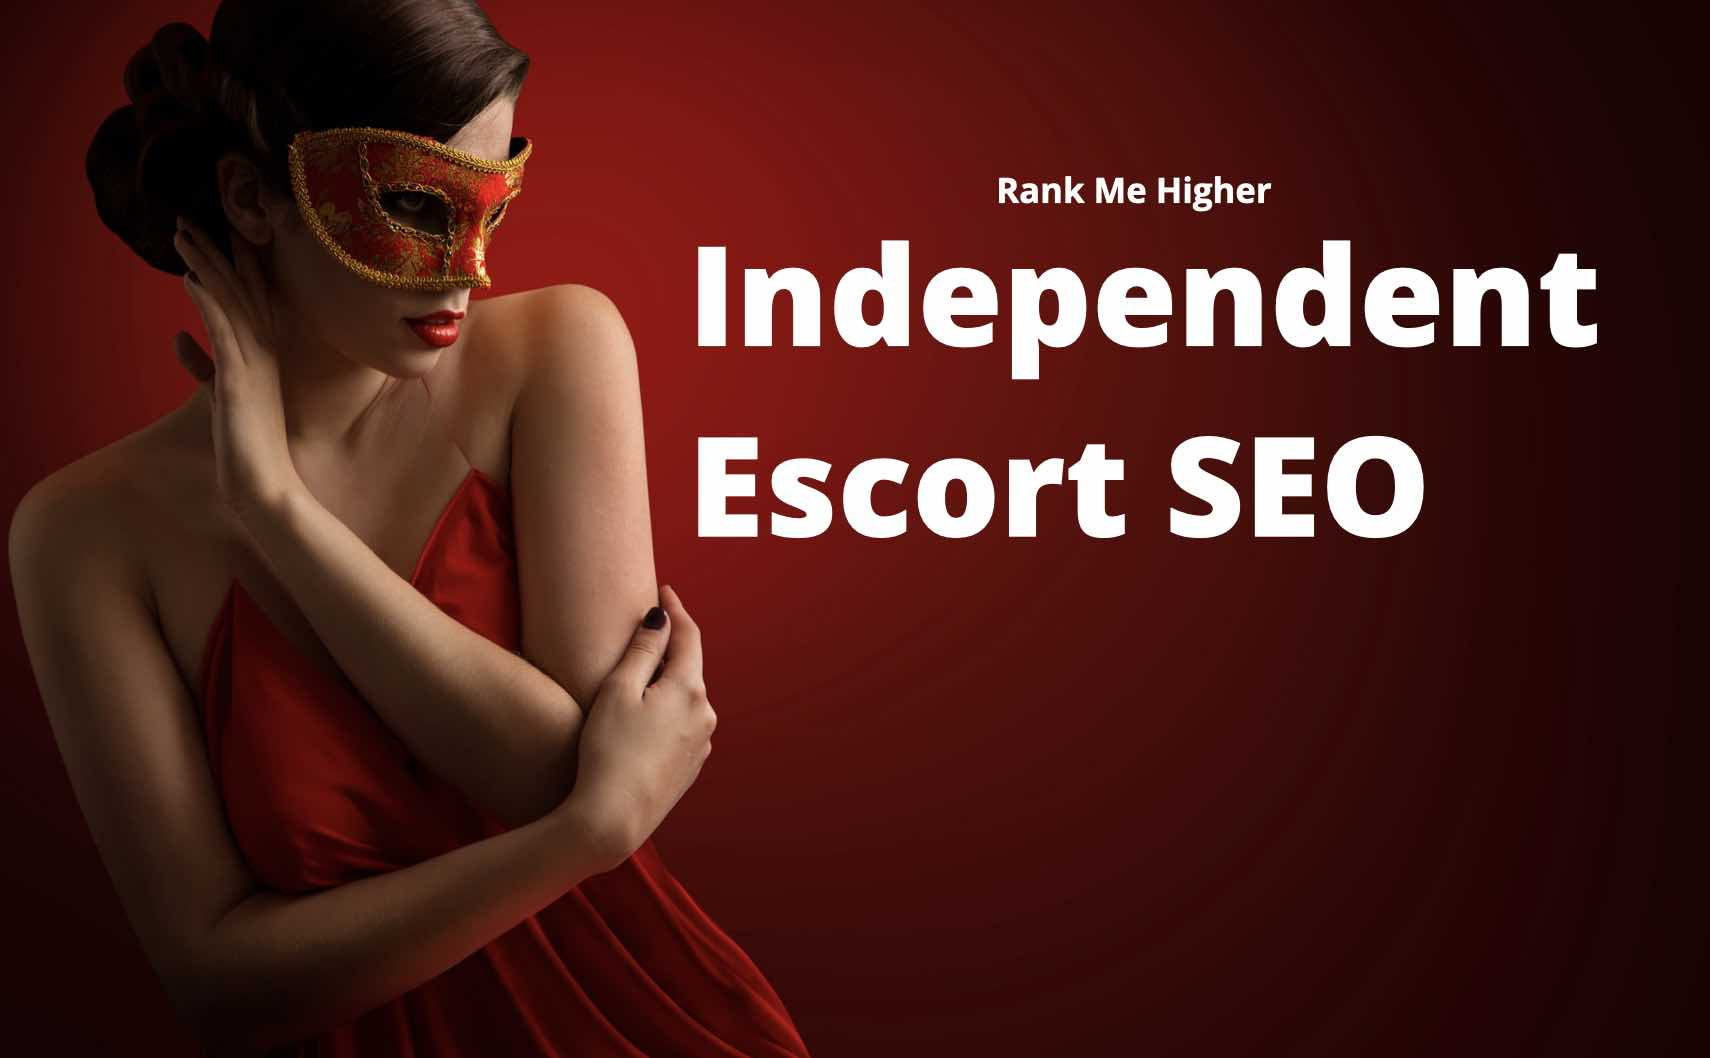 Escort SEO services